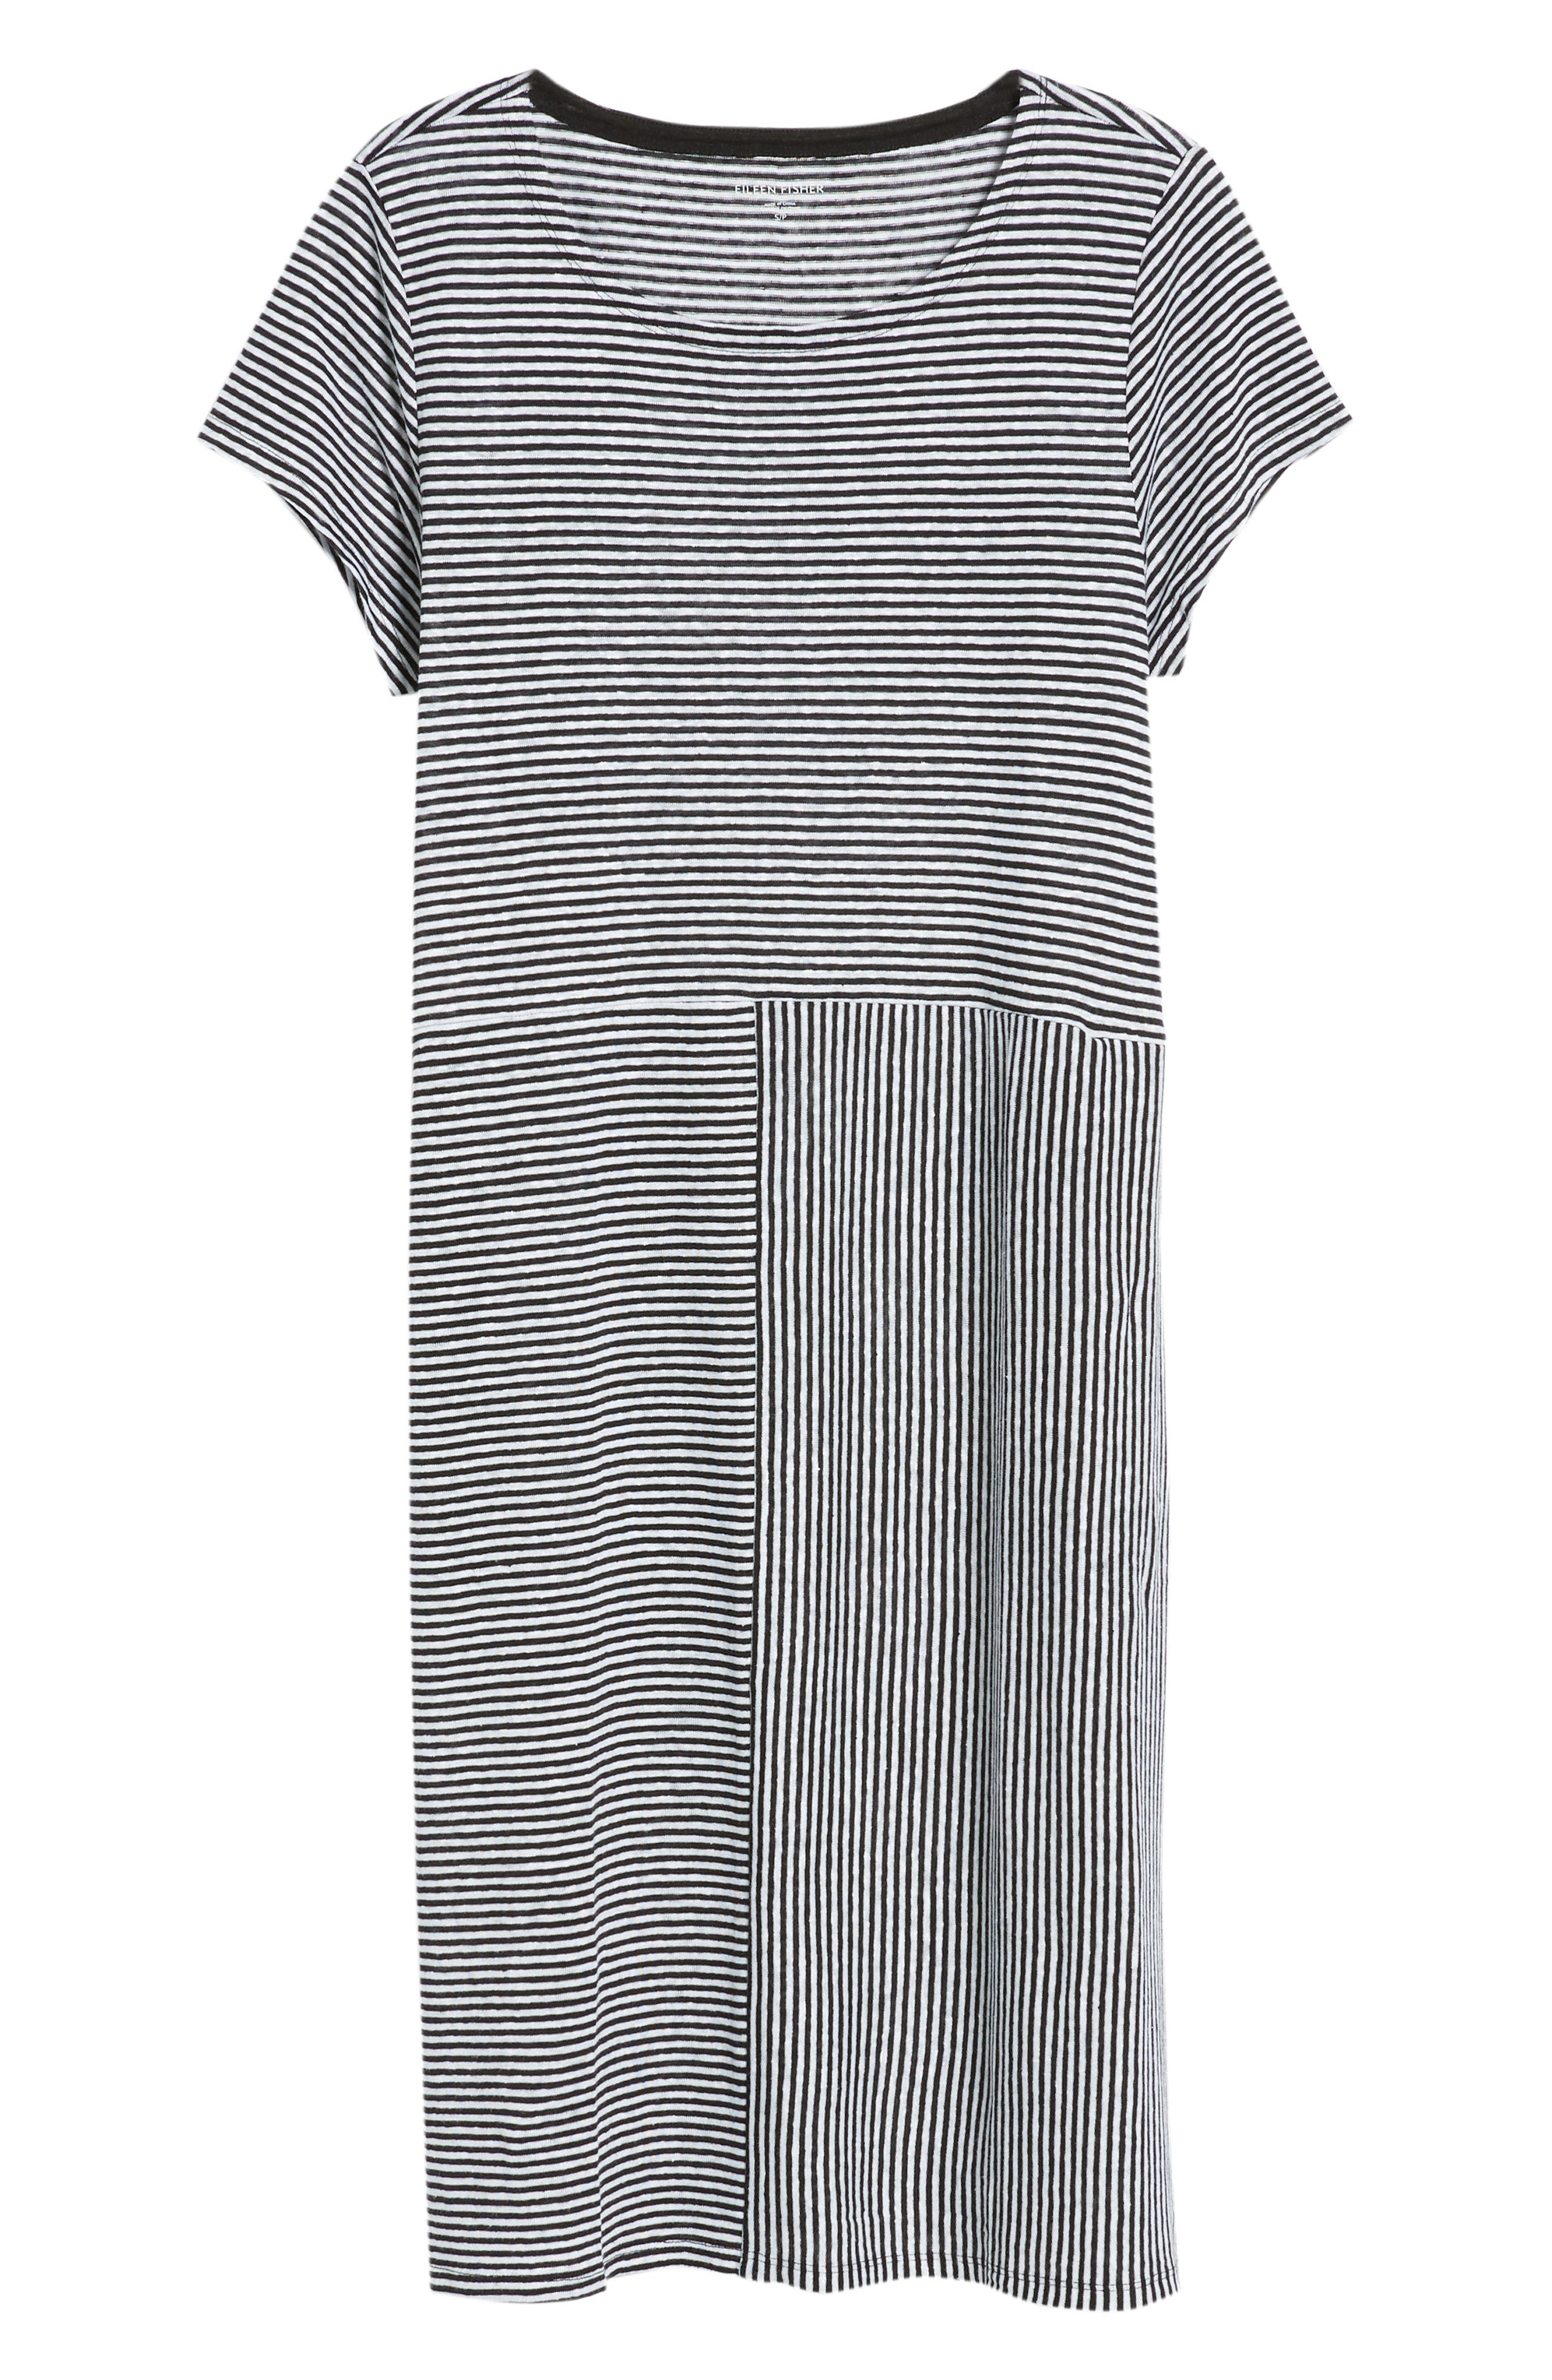 Stripe Organic Linen Jersey Shift Dress,                             Alternate thumbnail 7, color,                             BLACK/ WHITE